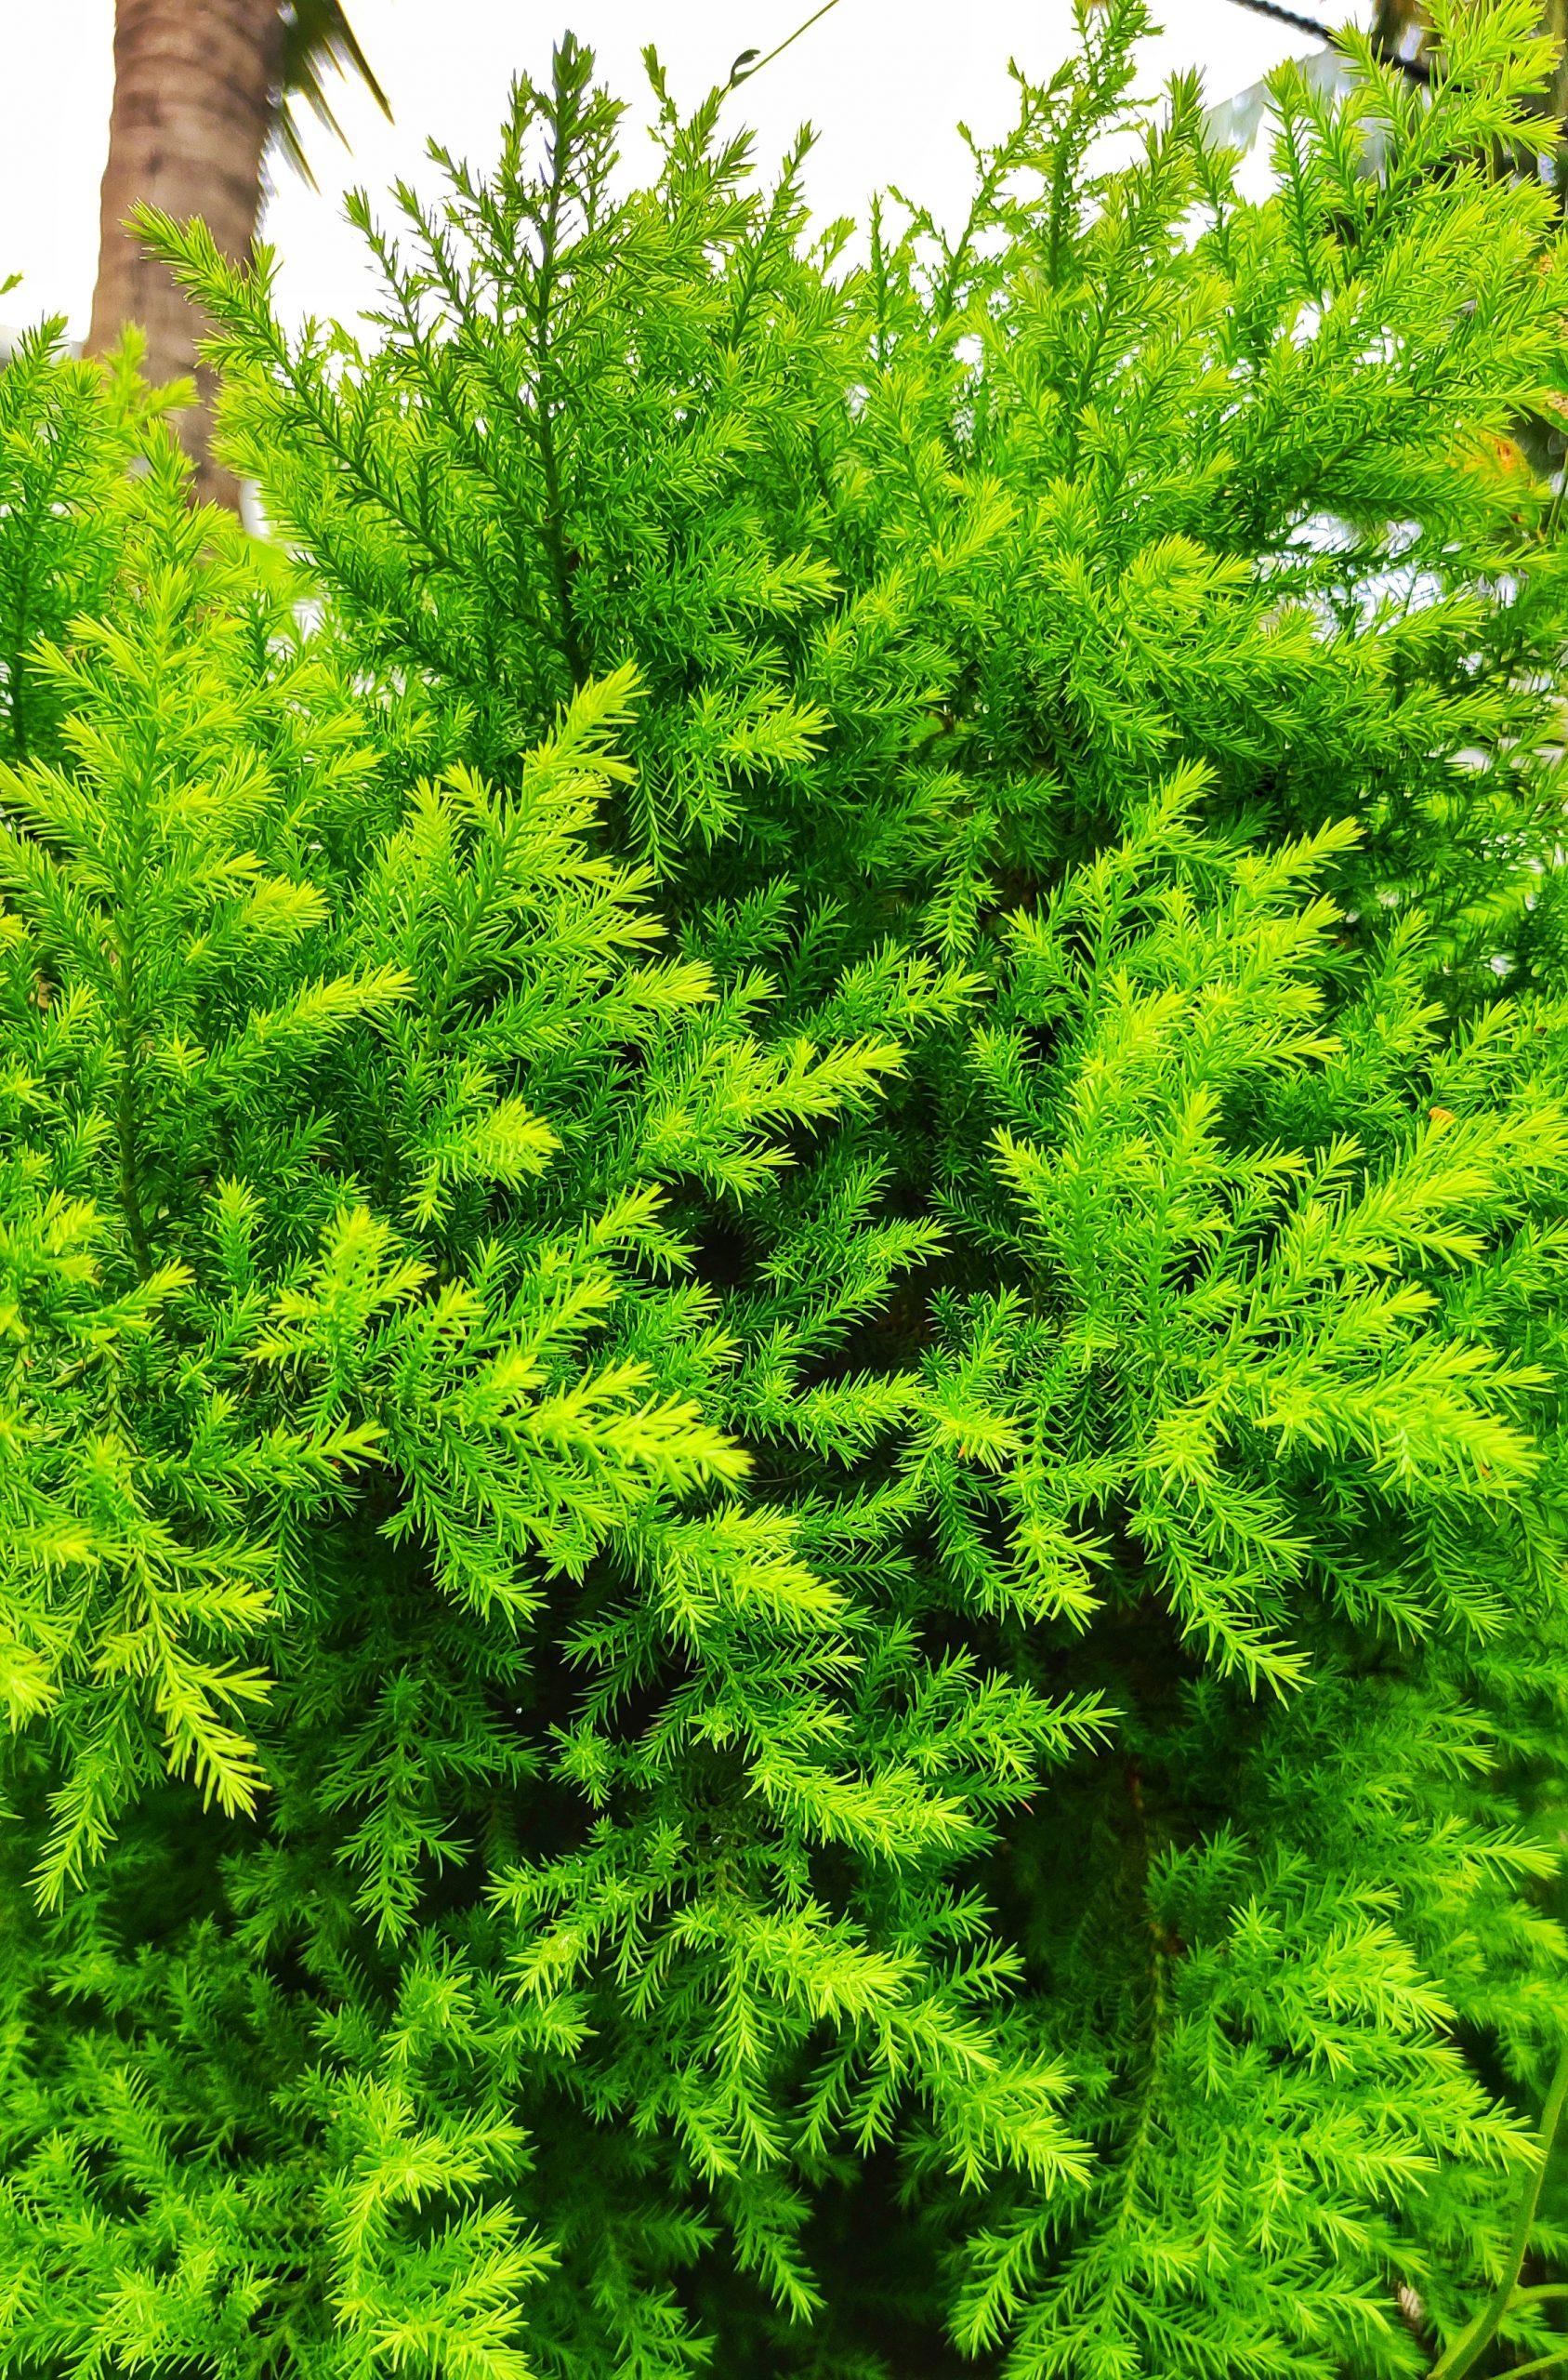 Bunch of Greenery Grass